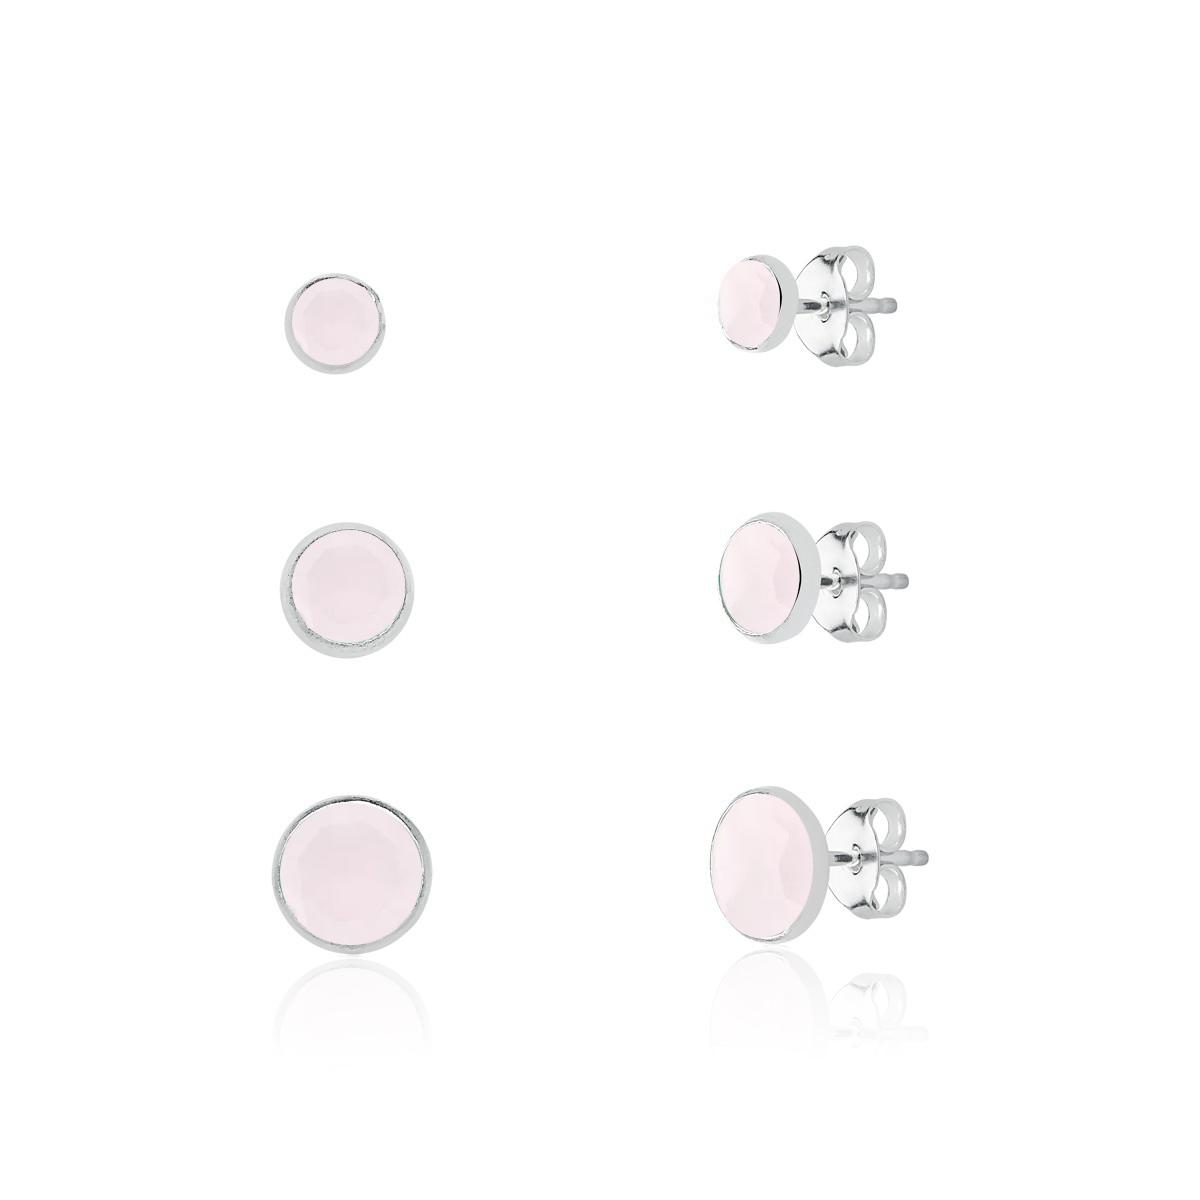 Brinco Kit Cristal Rosa Fosco